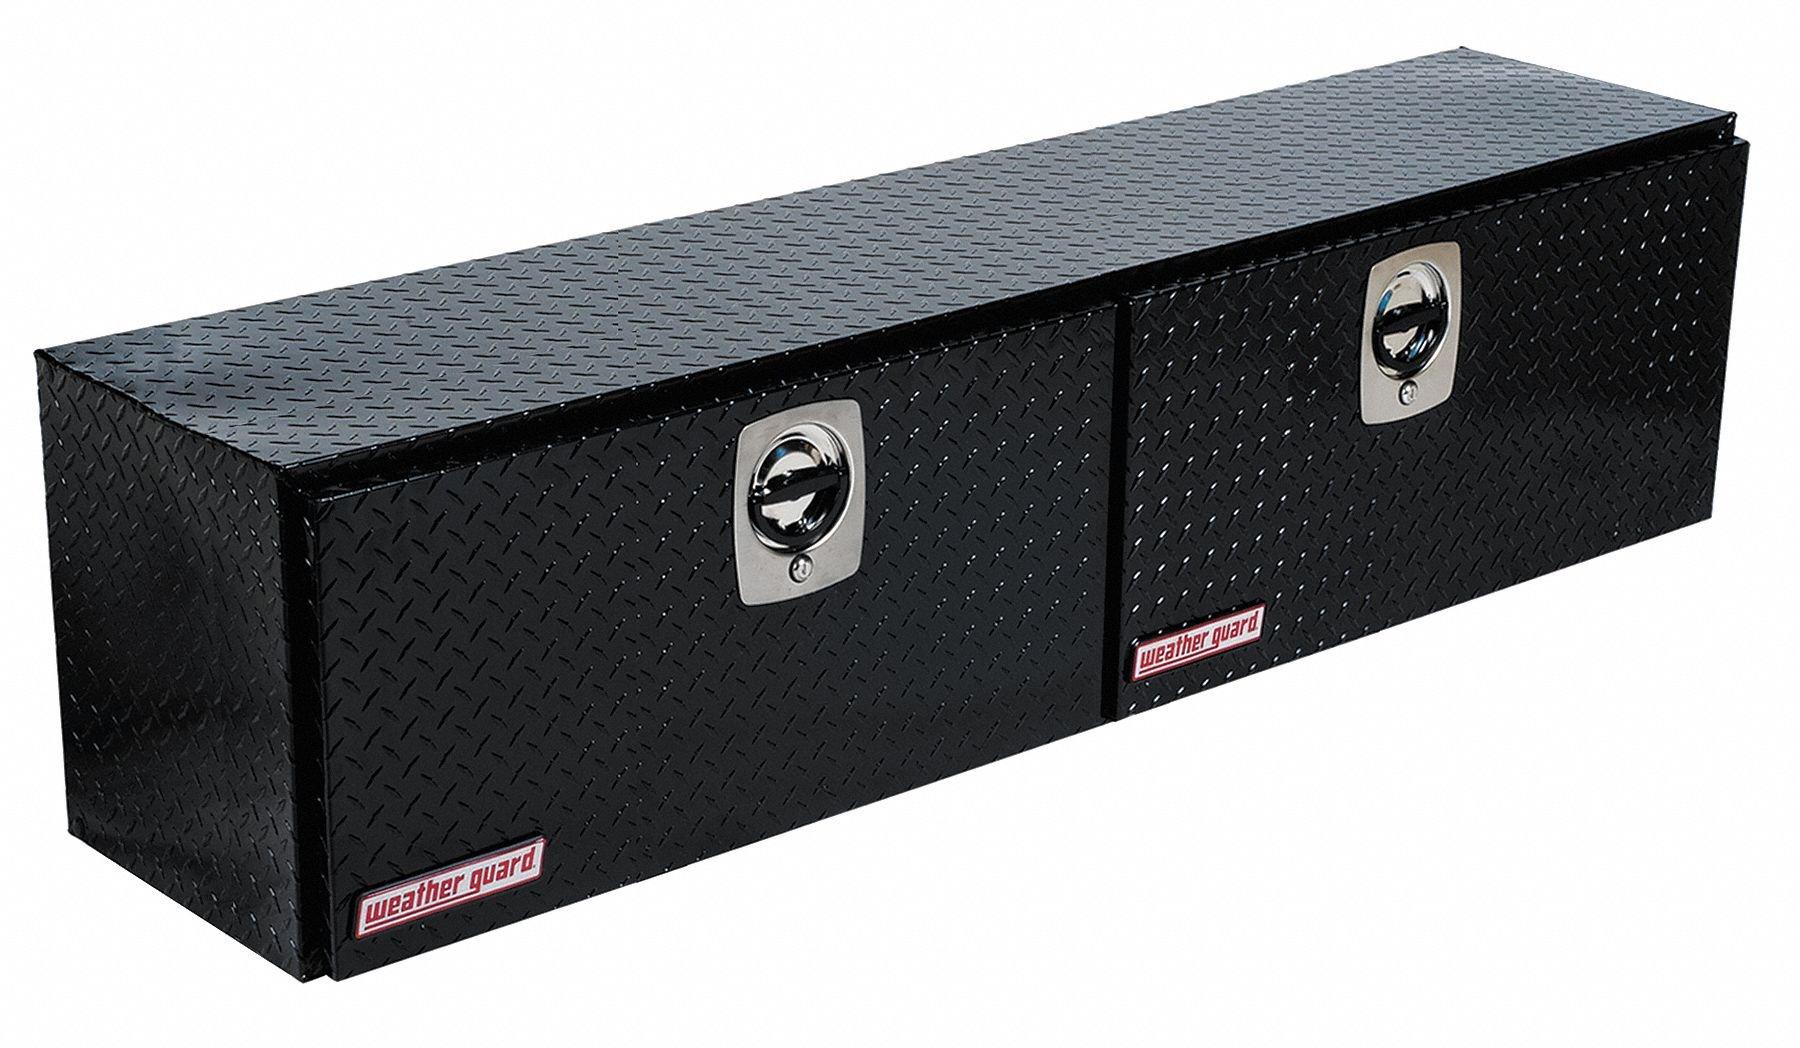 Aluminum Topside Truck Box, Black, Double, 8.9 cu. ft.